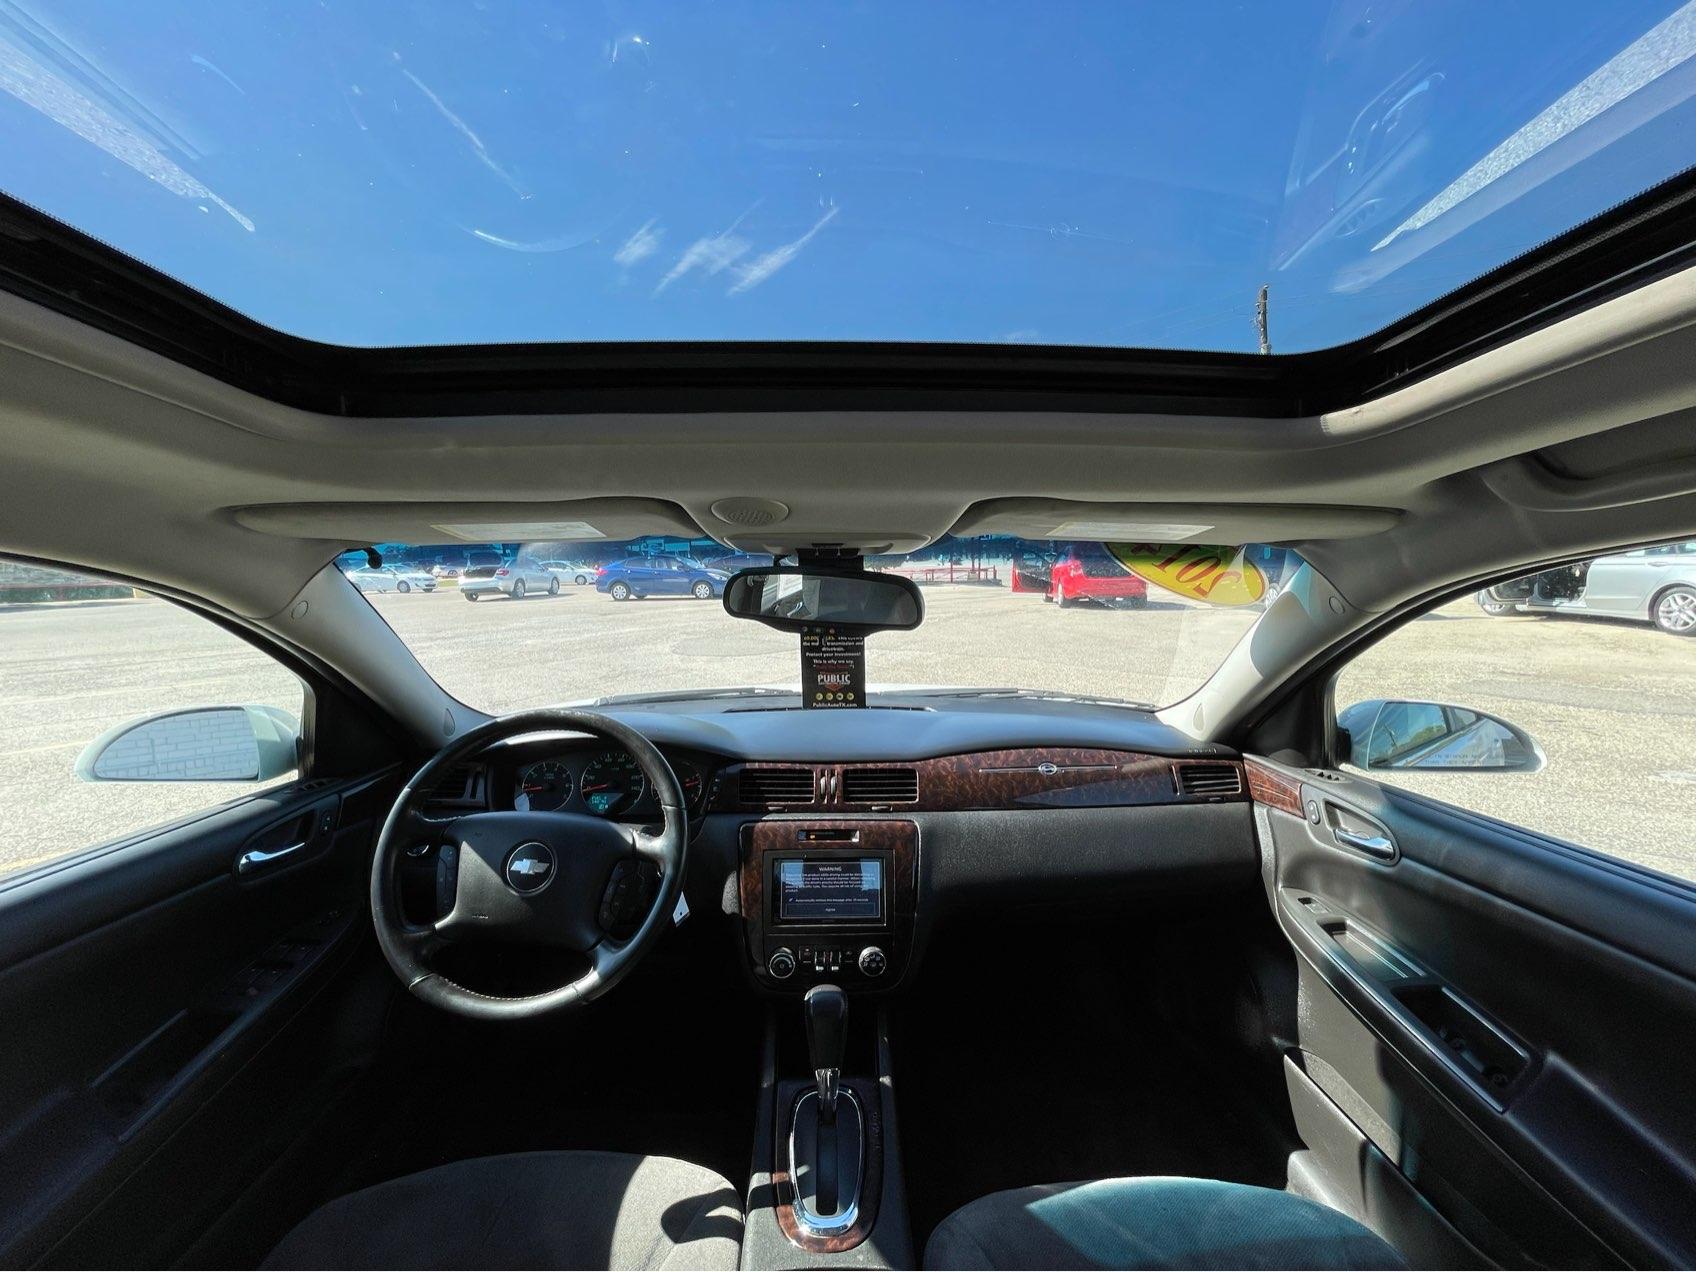 used vehicle - Sedan CHEVROLET IMPALA LIMITED 2014